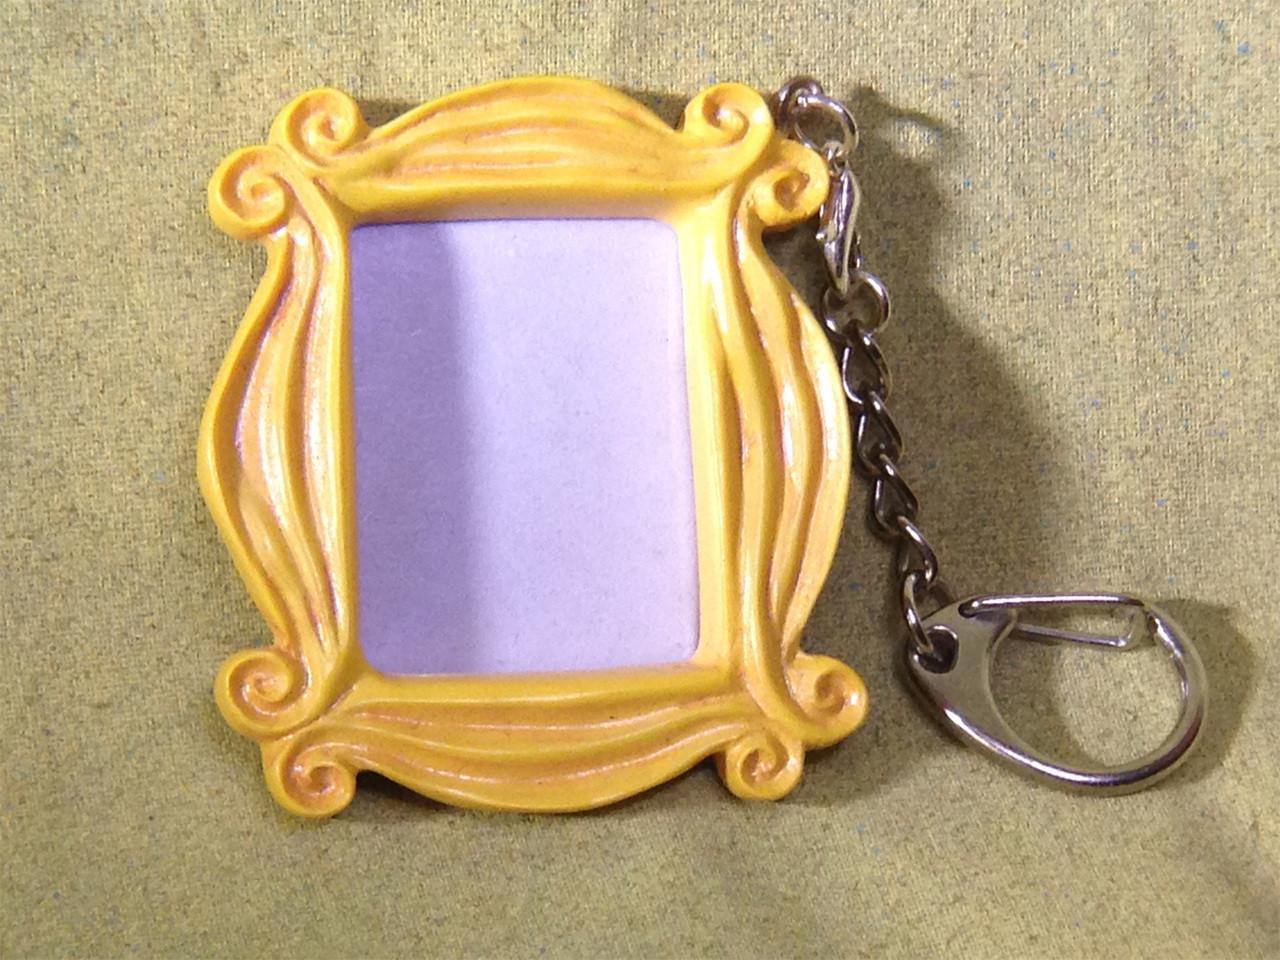 Friends Monica\u0027s Famous Peephole Door Frame Necklace and Key Chain & Friends Monica\u0027s Famous Peephole Door Frame Necklace and Key Chain ...